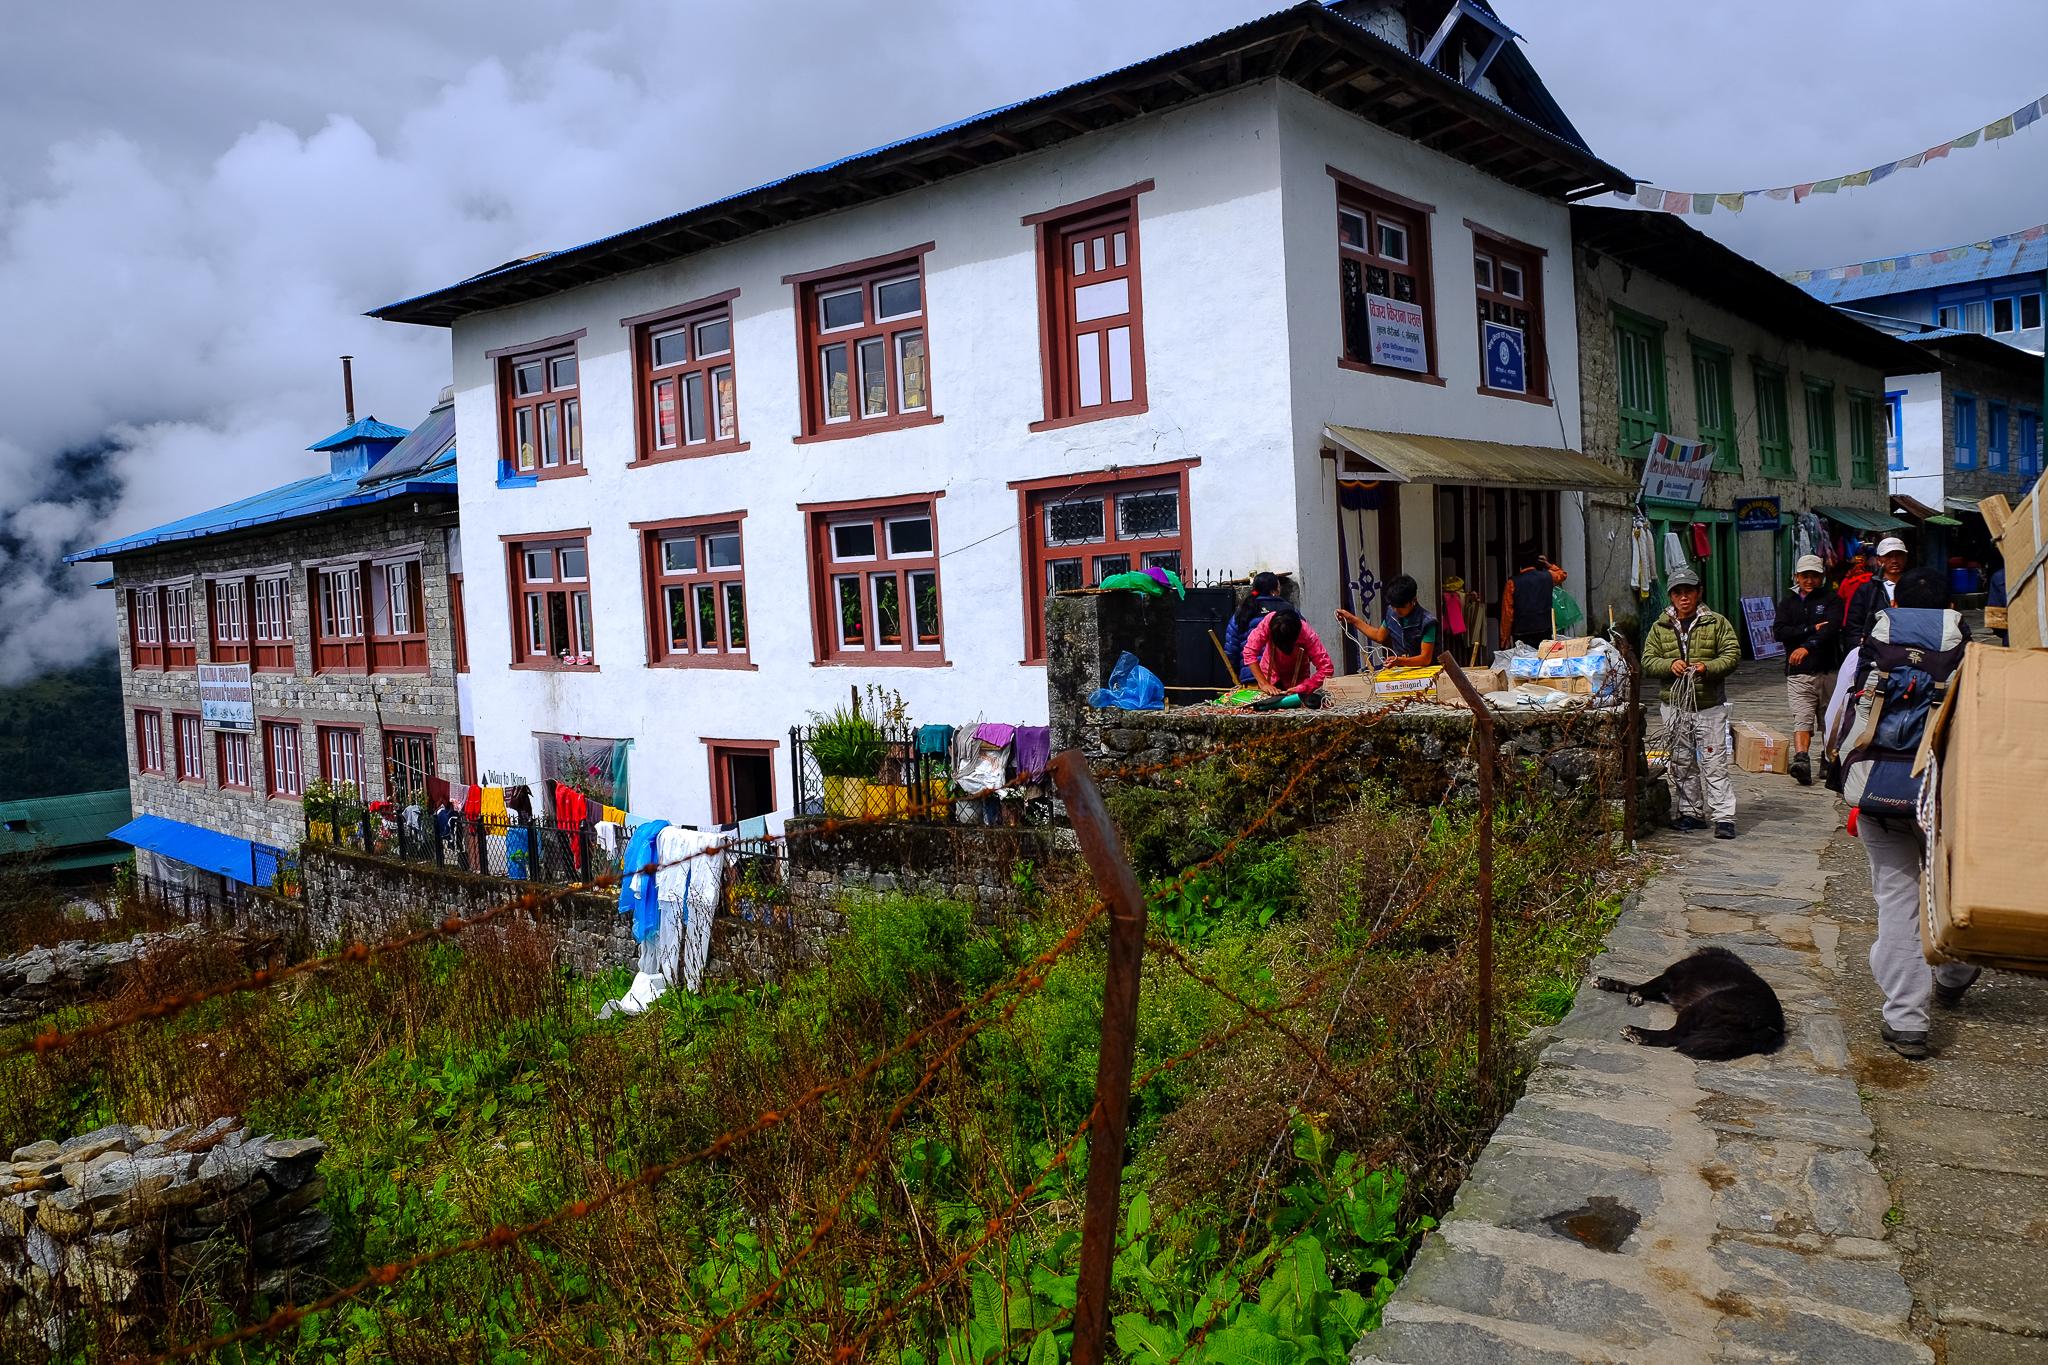 The village of Lukla